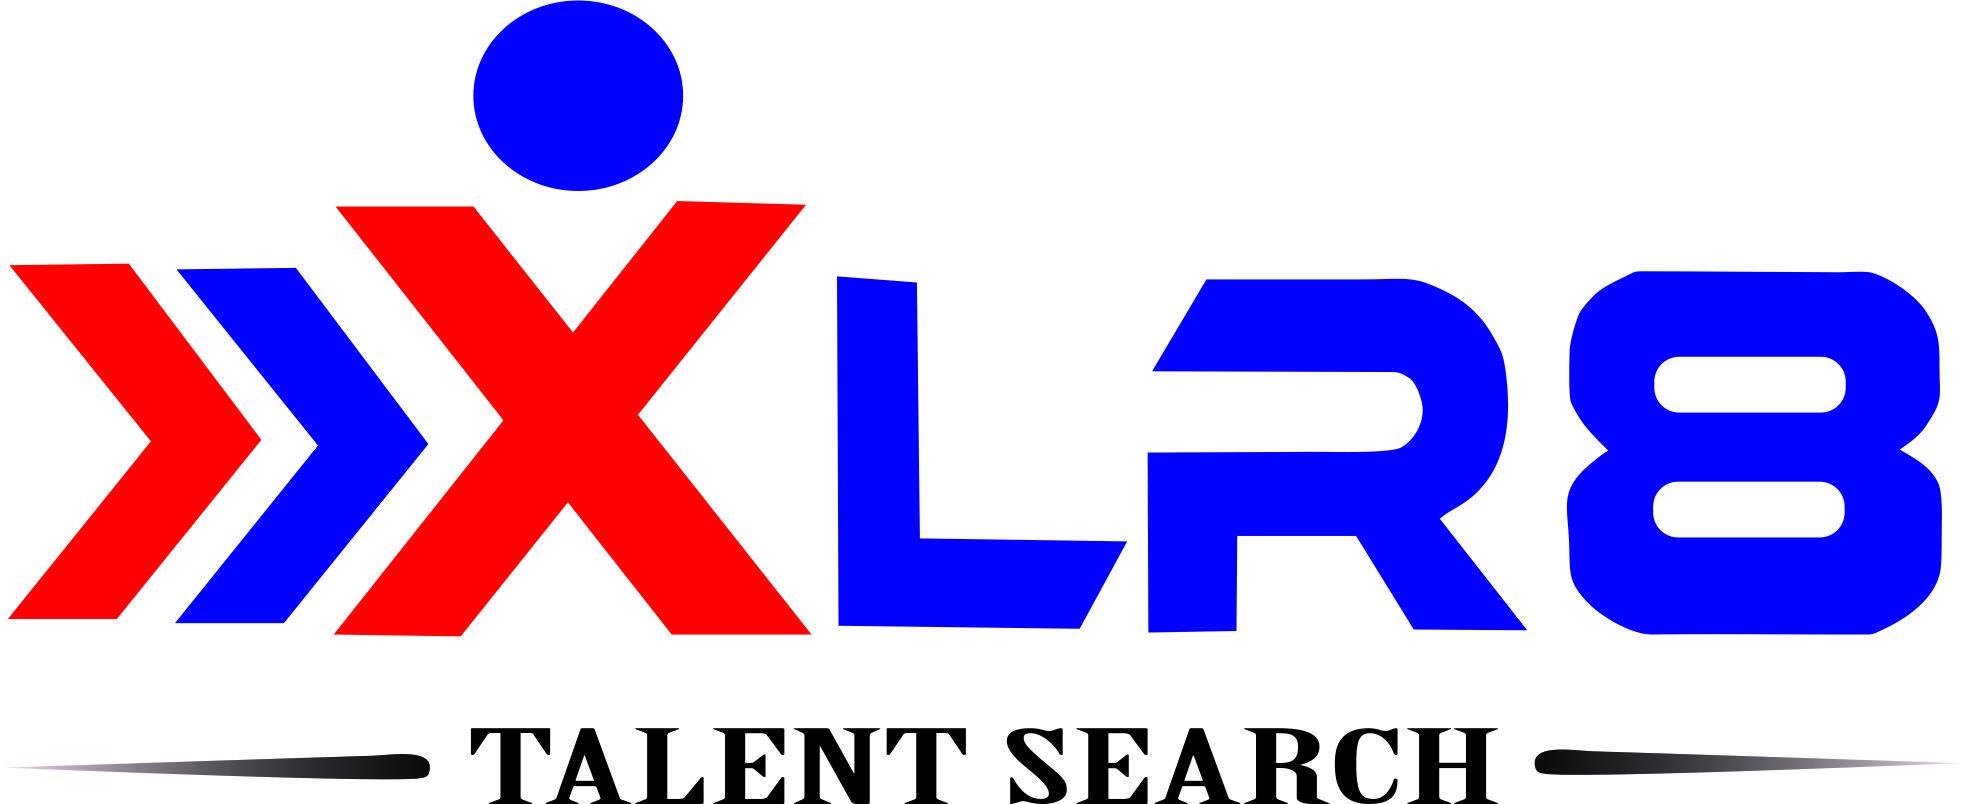 xlr8 talent search